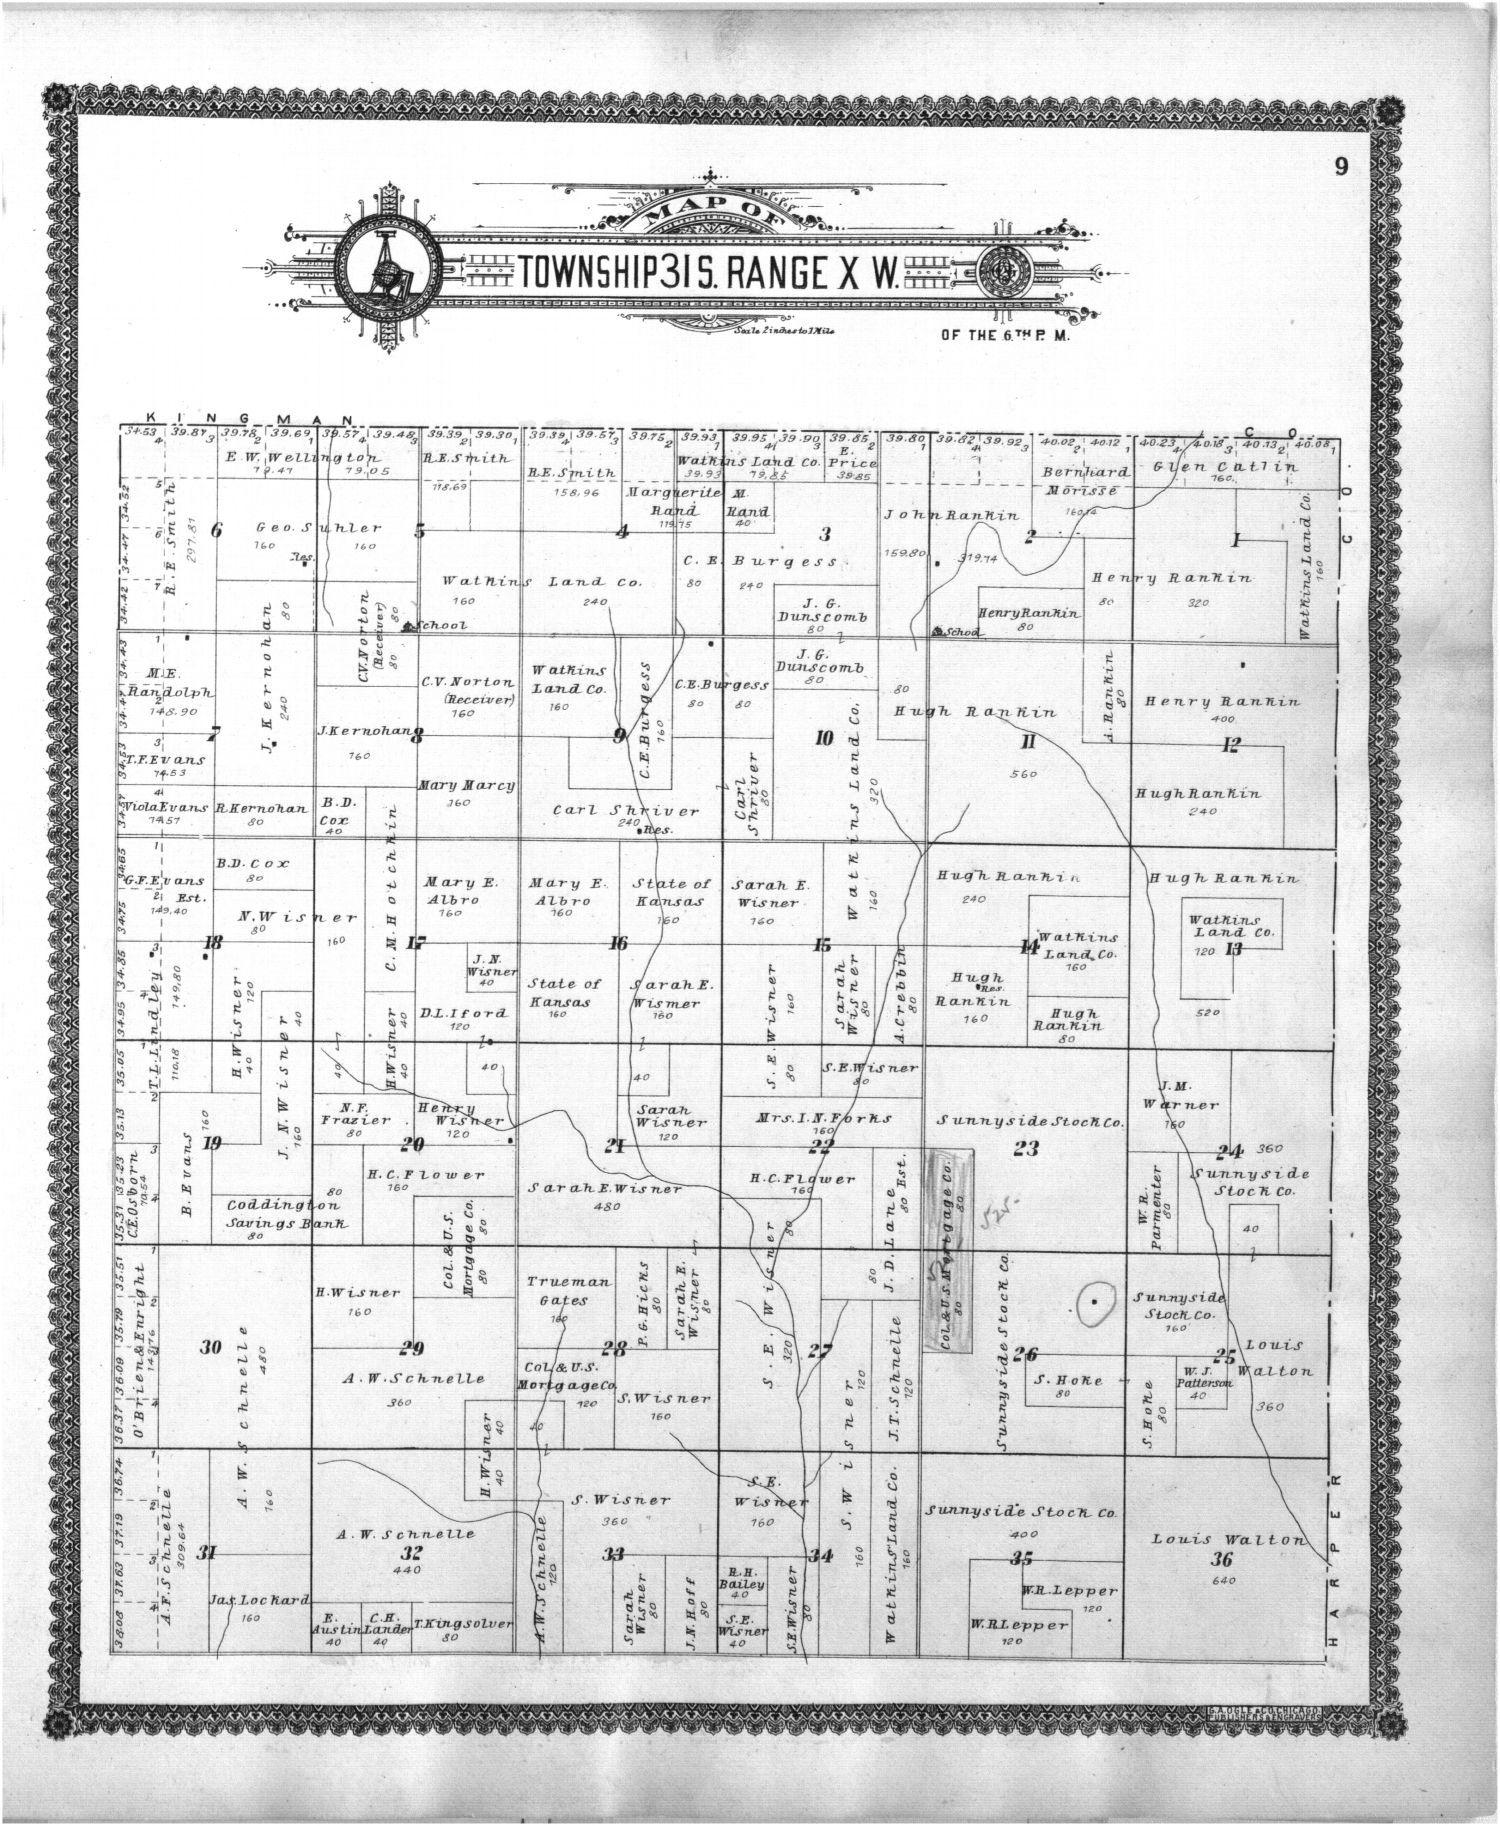 Standard atlas of Barber County, Kansas - 9